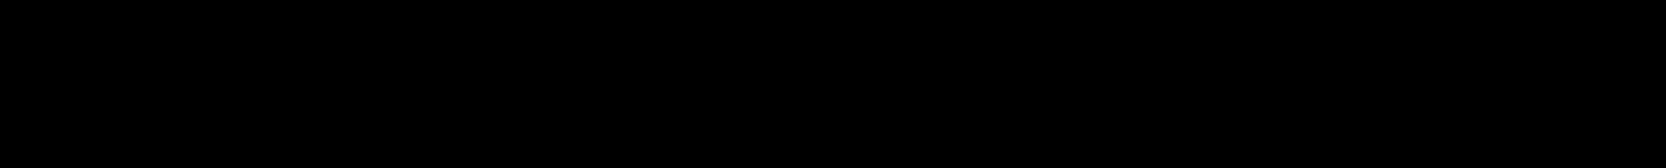 Merry Jane logo.png